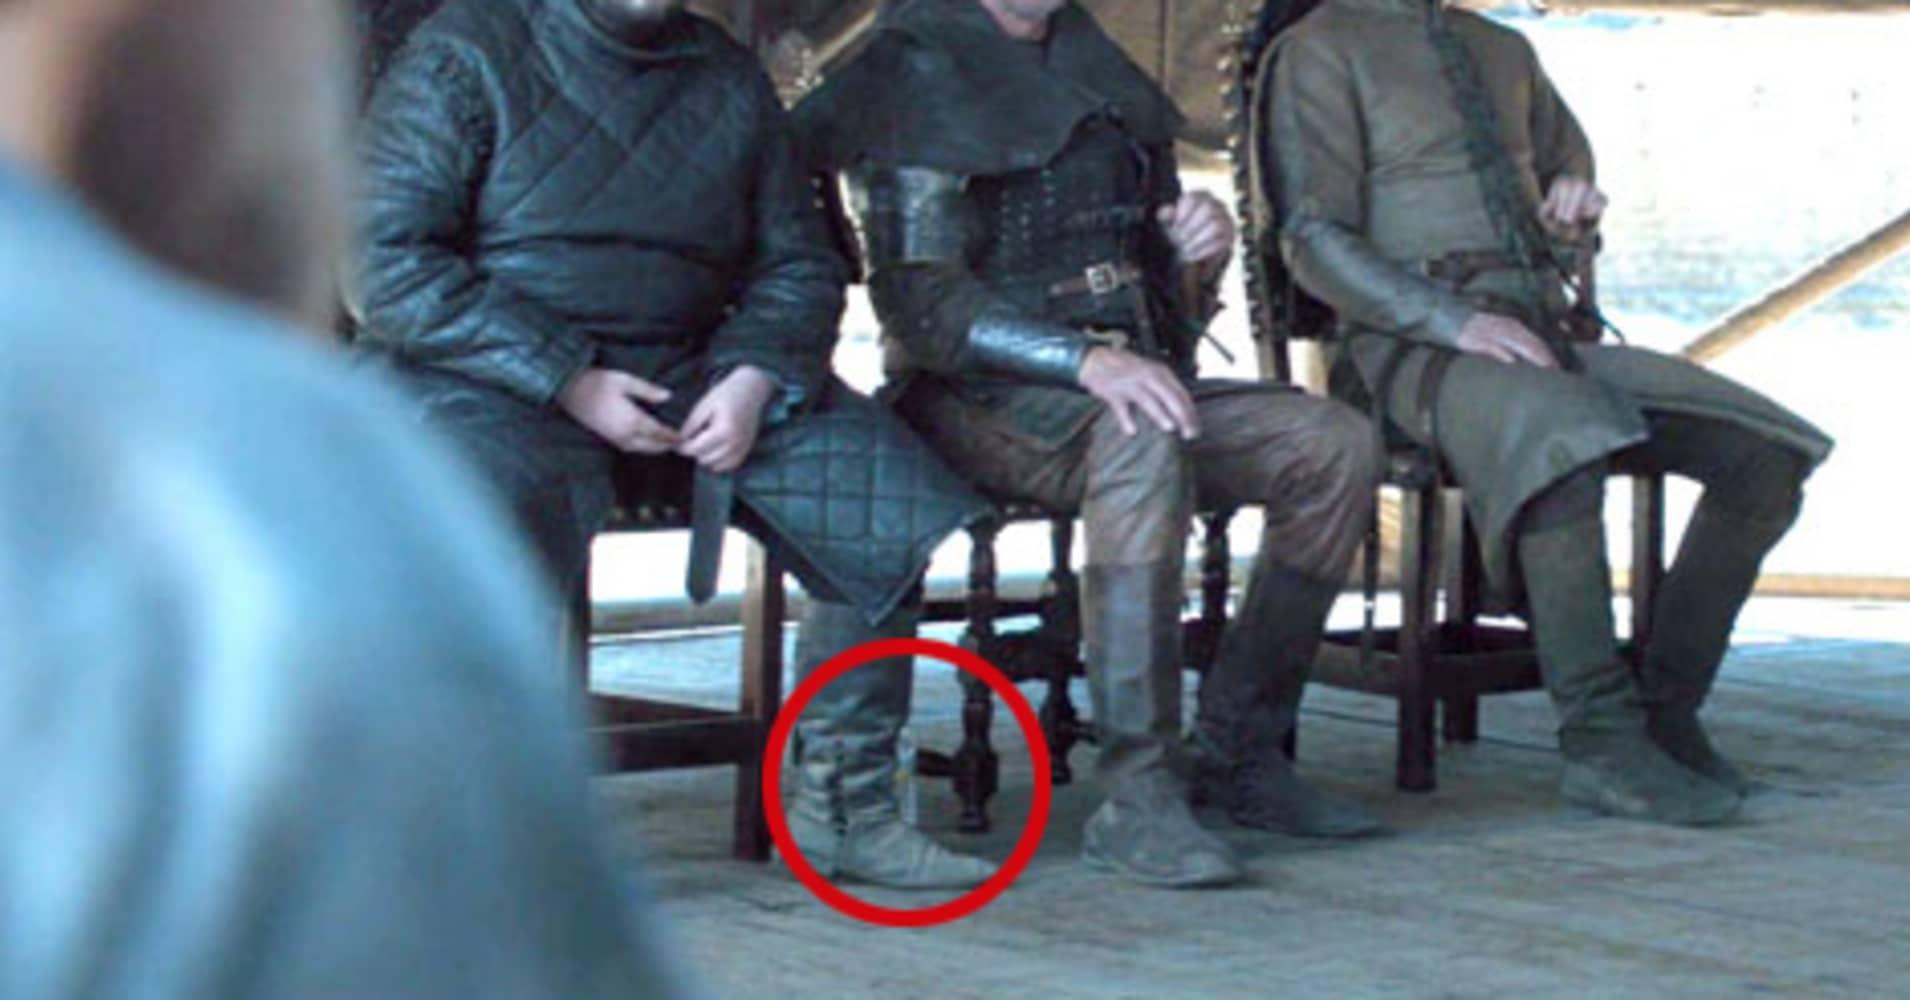 Game of Thrones' finale left water bottles in key scene